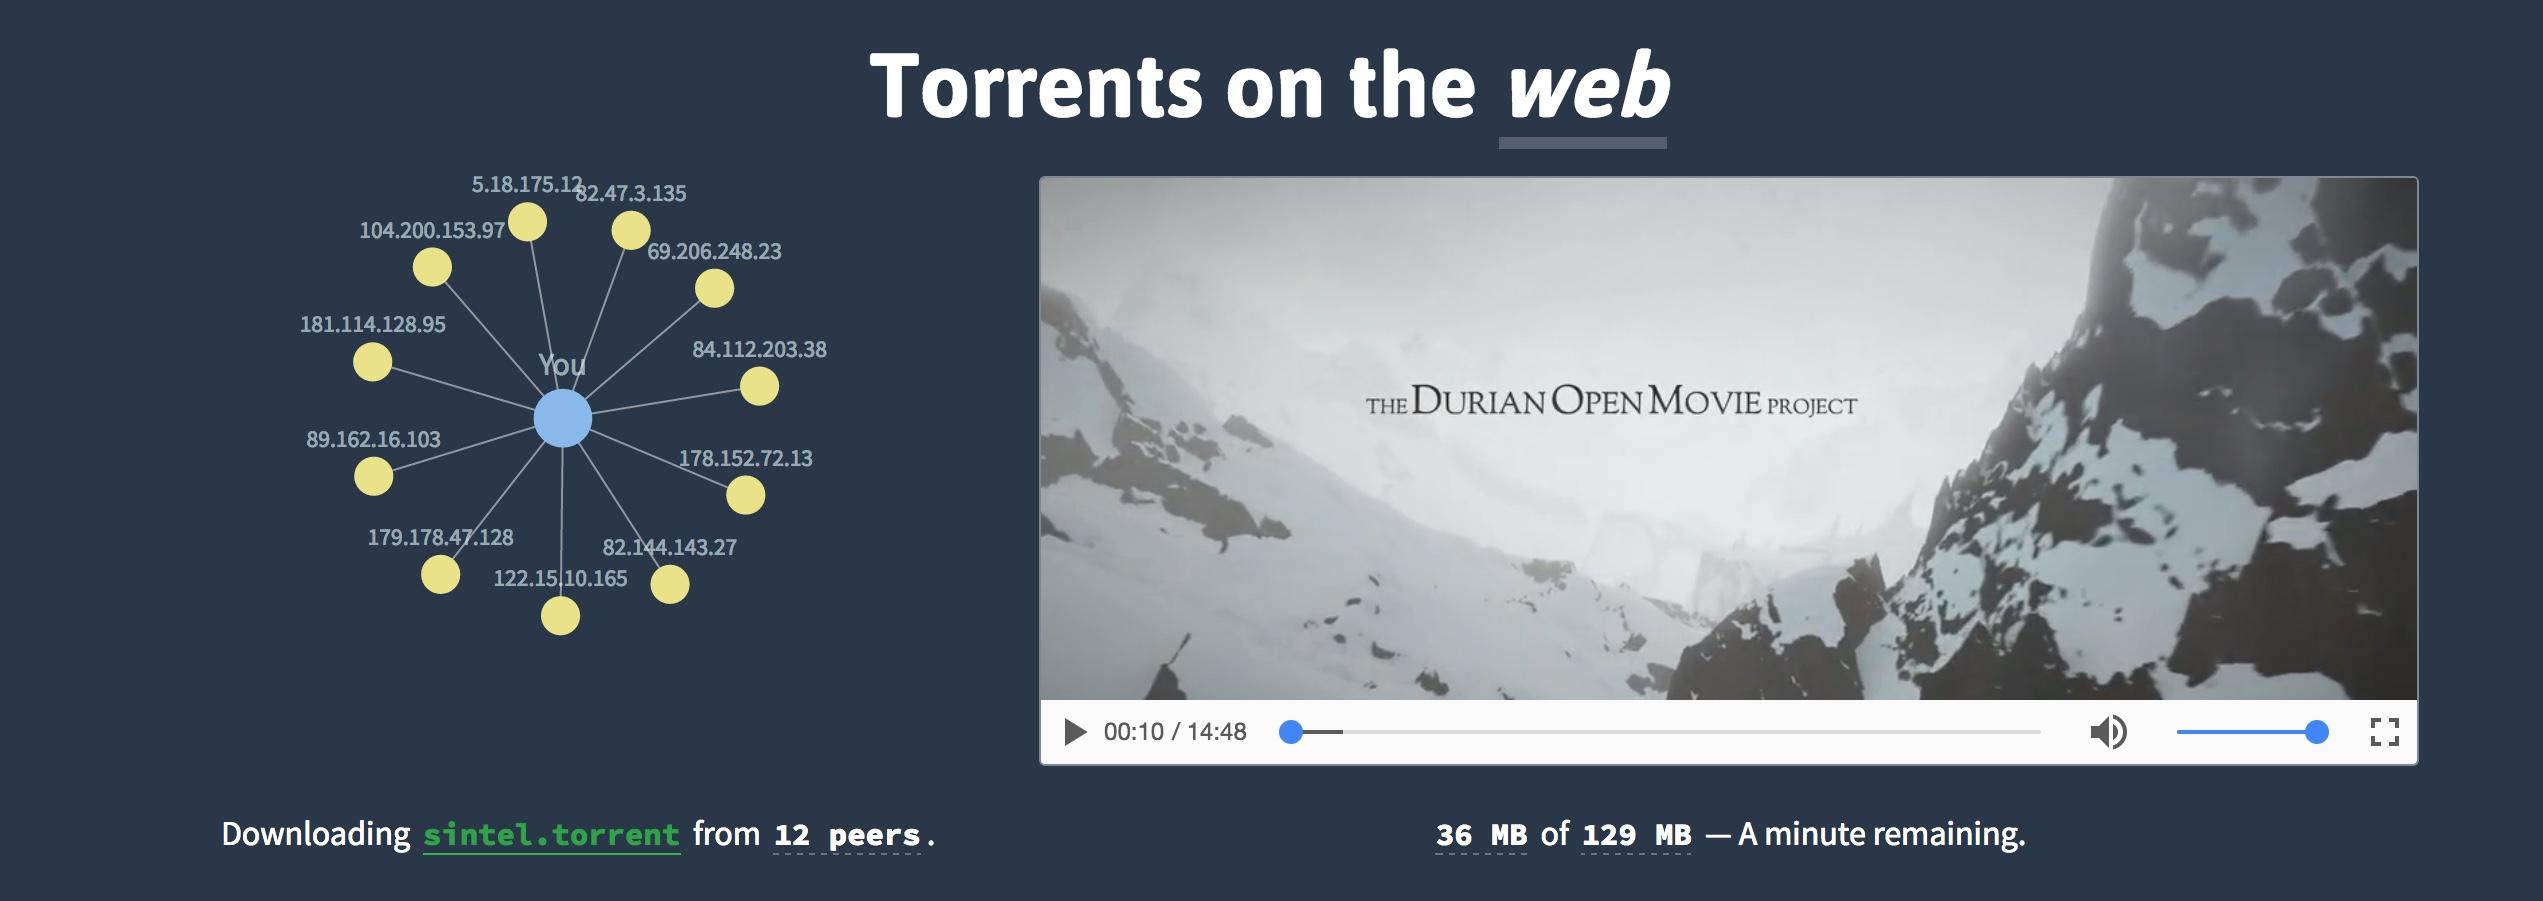 webtorrent homepage